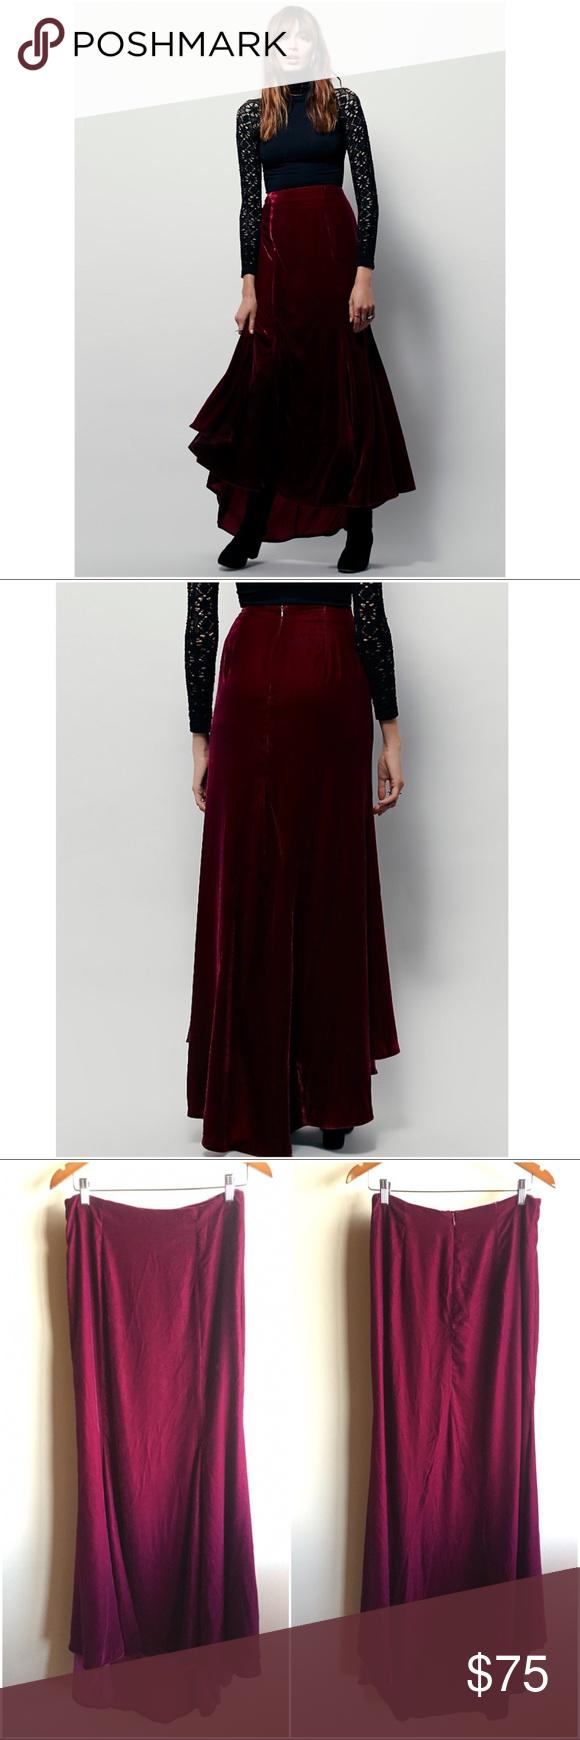 d503745e706 Free People X Curtain Call velvet maxi skirt Rare